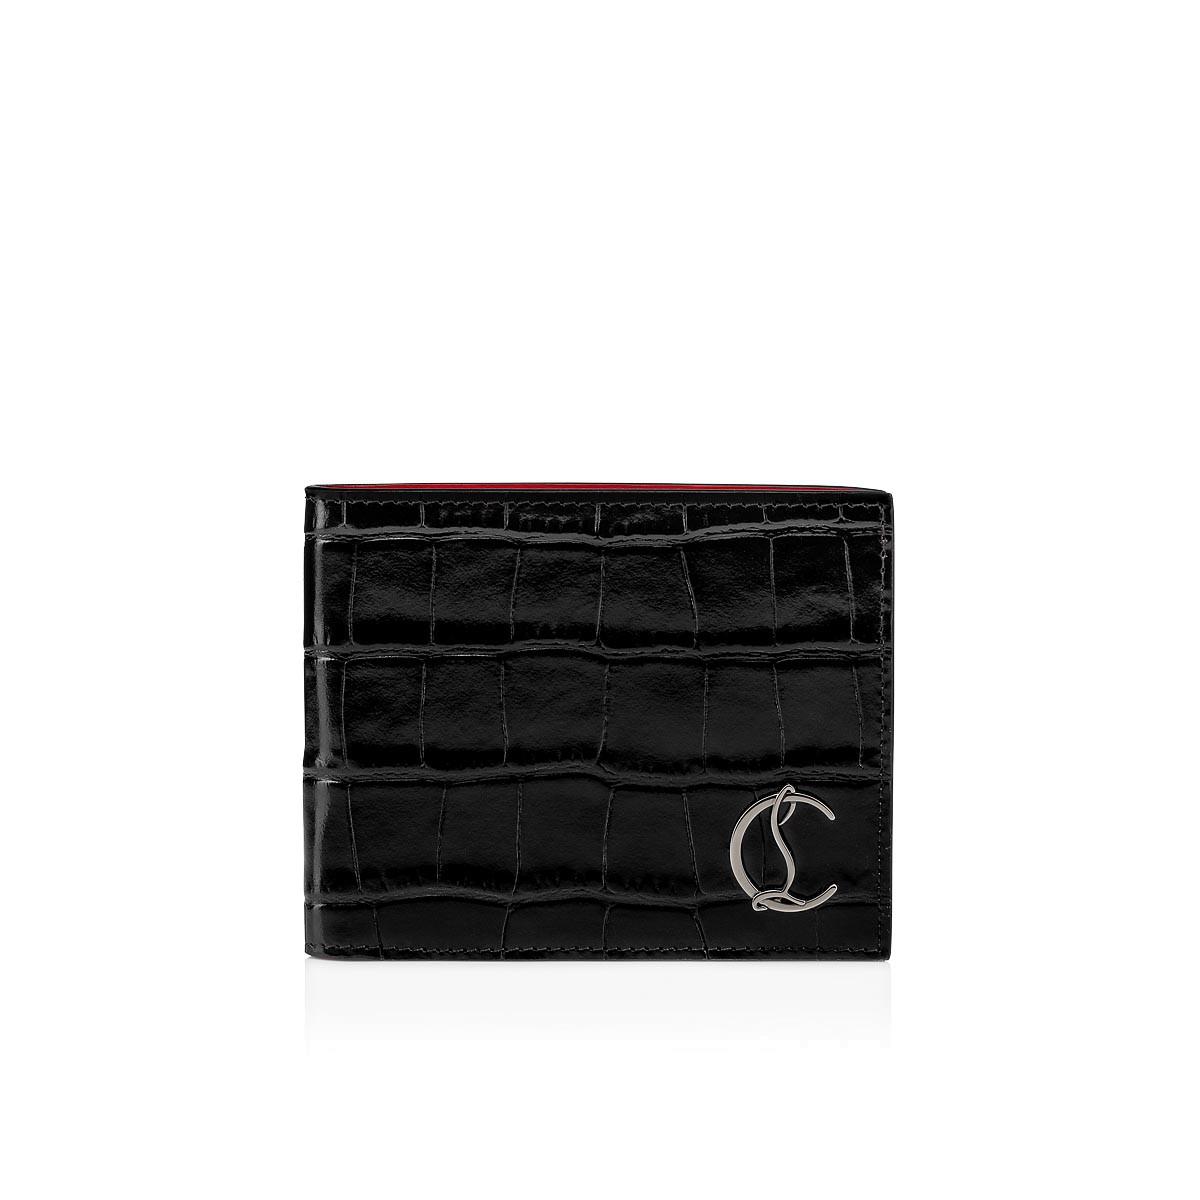 皮夾/配件 - M Coolcard Wallet - Christian Louboutin